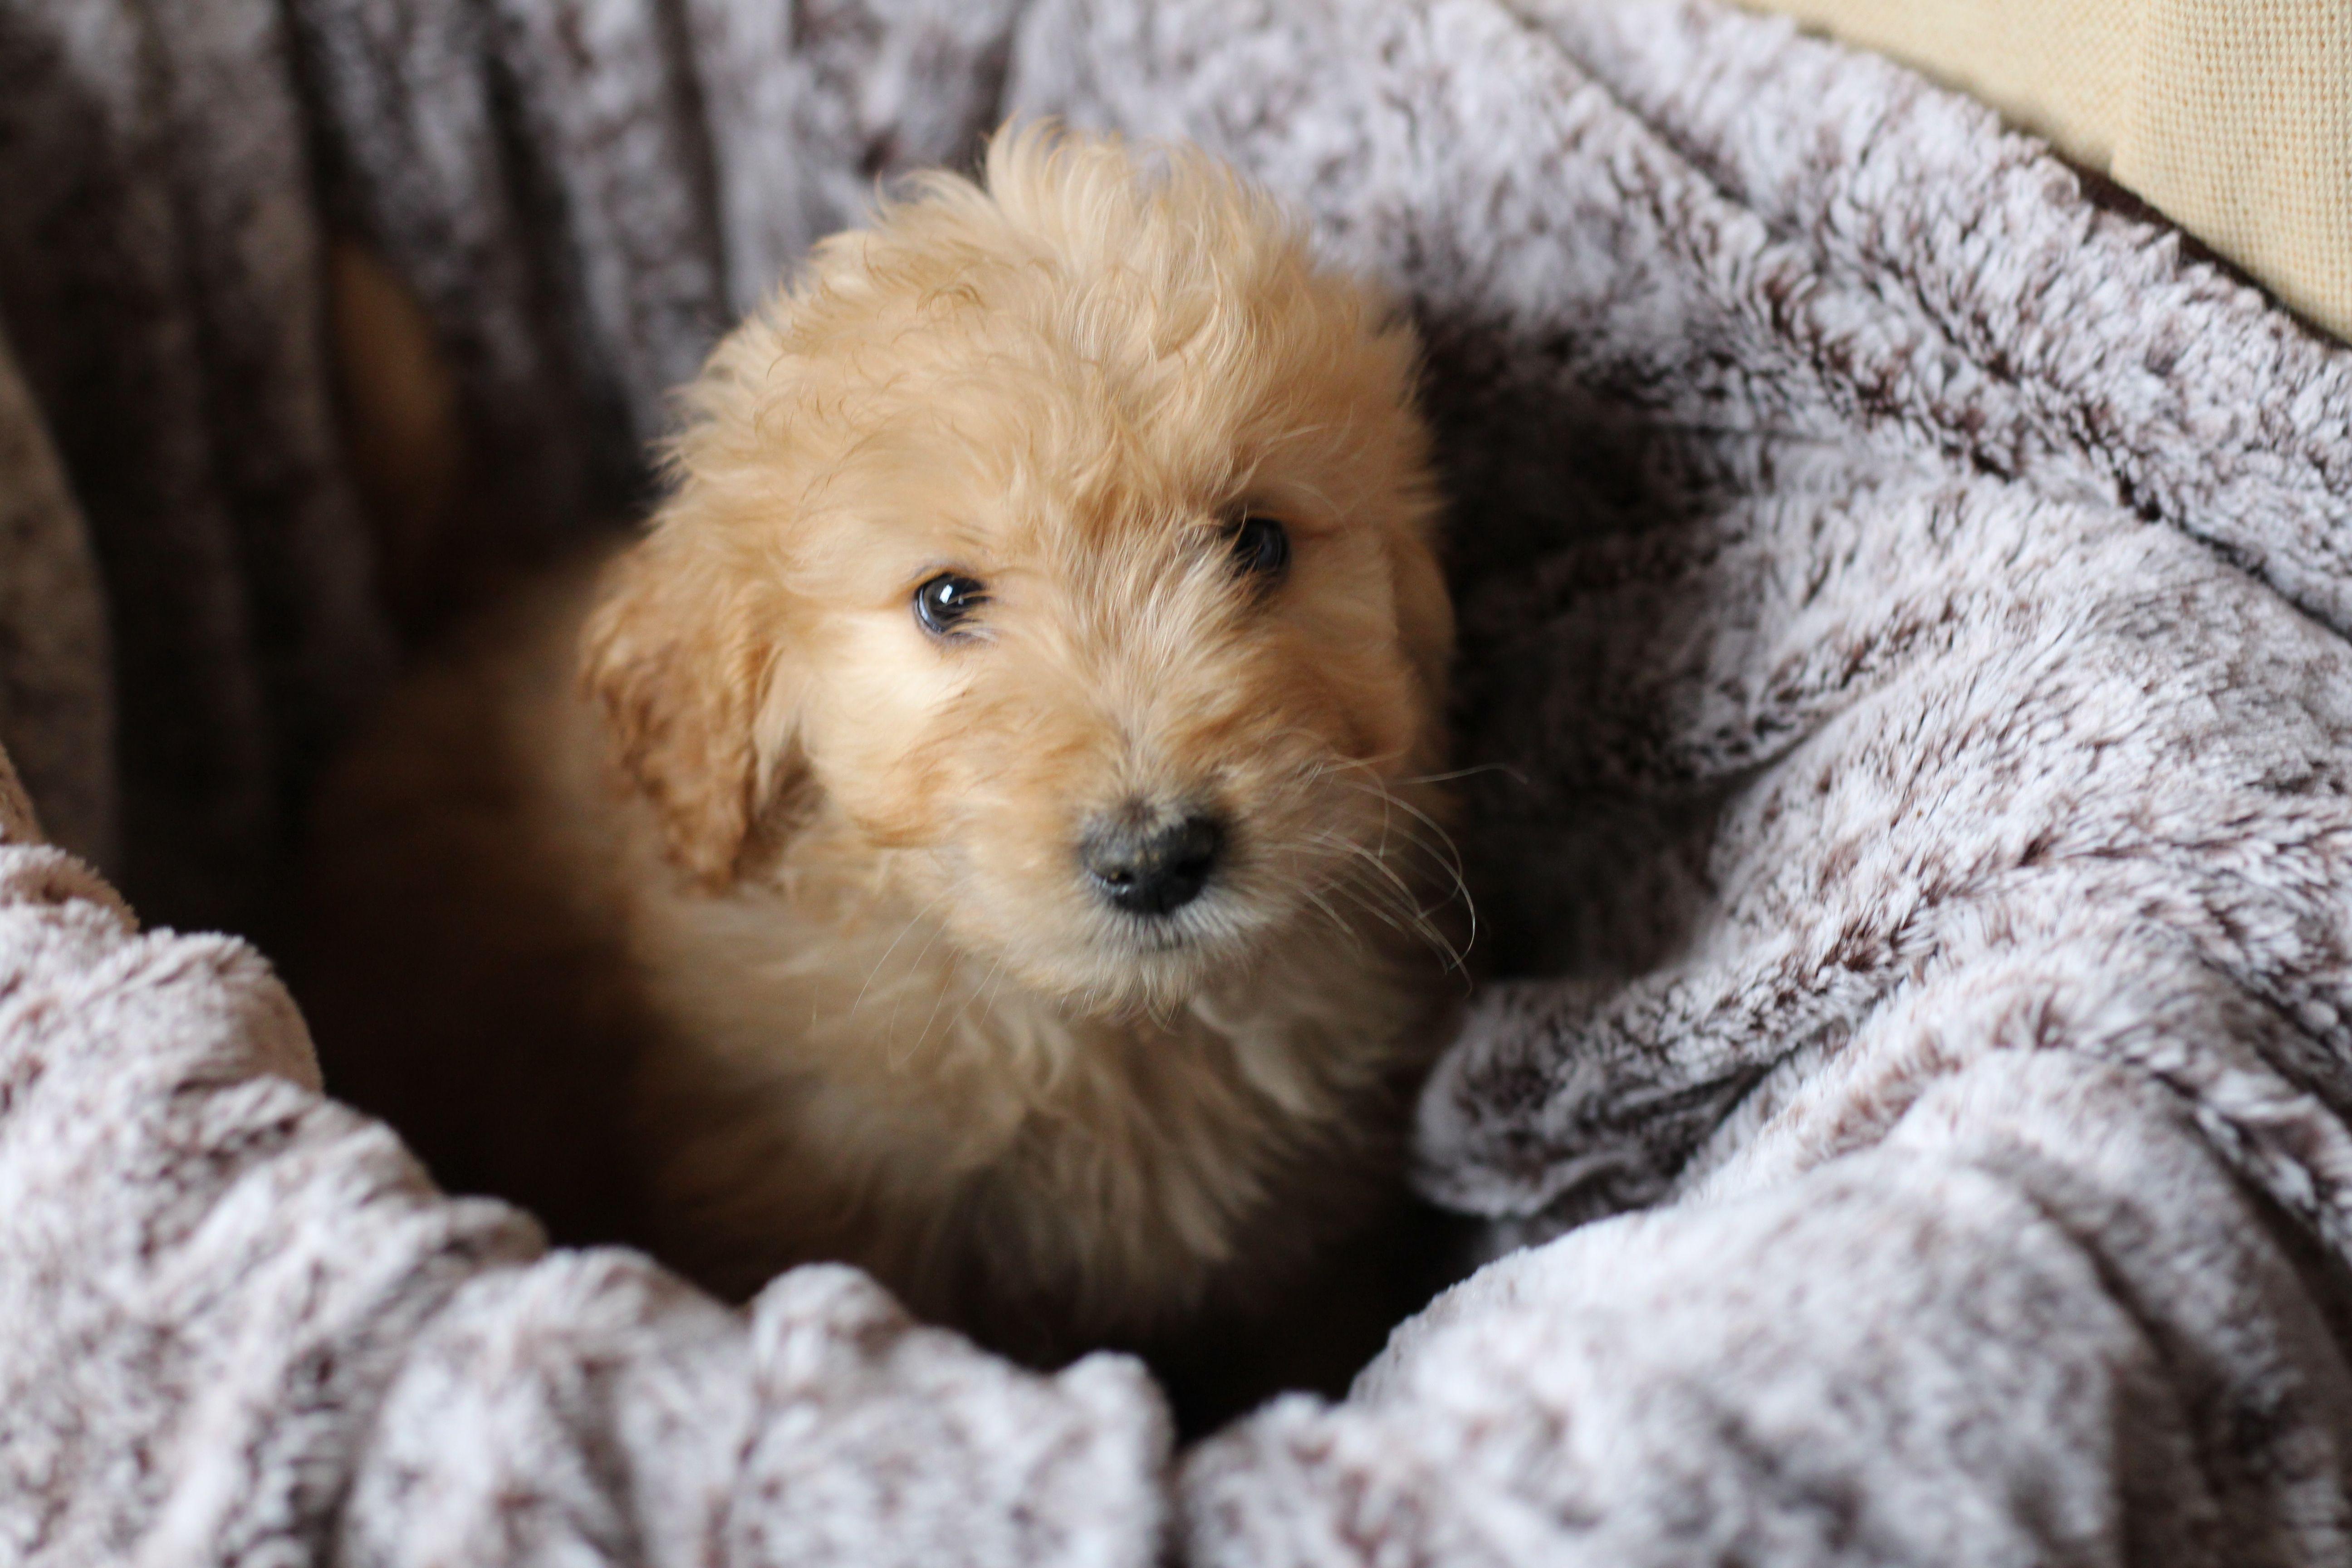 Goldendoodle goldendoodle goldendoodle puppy puppies